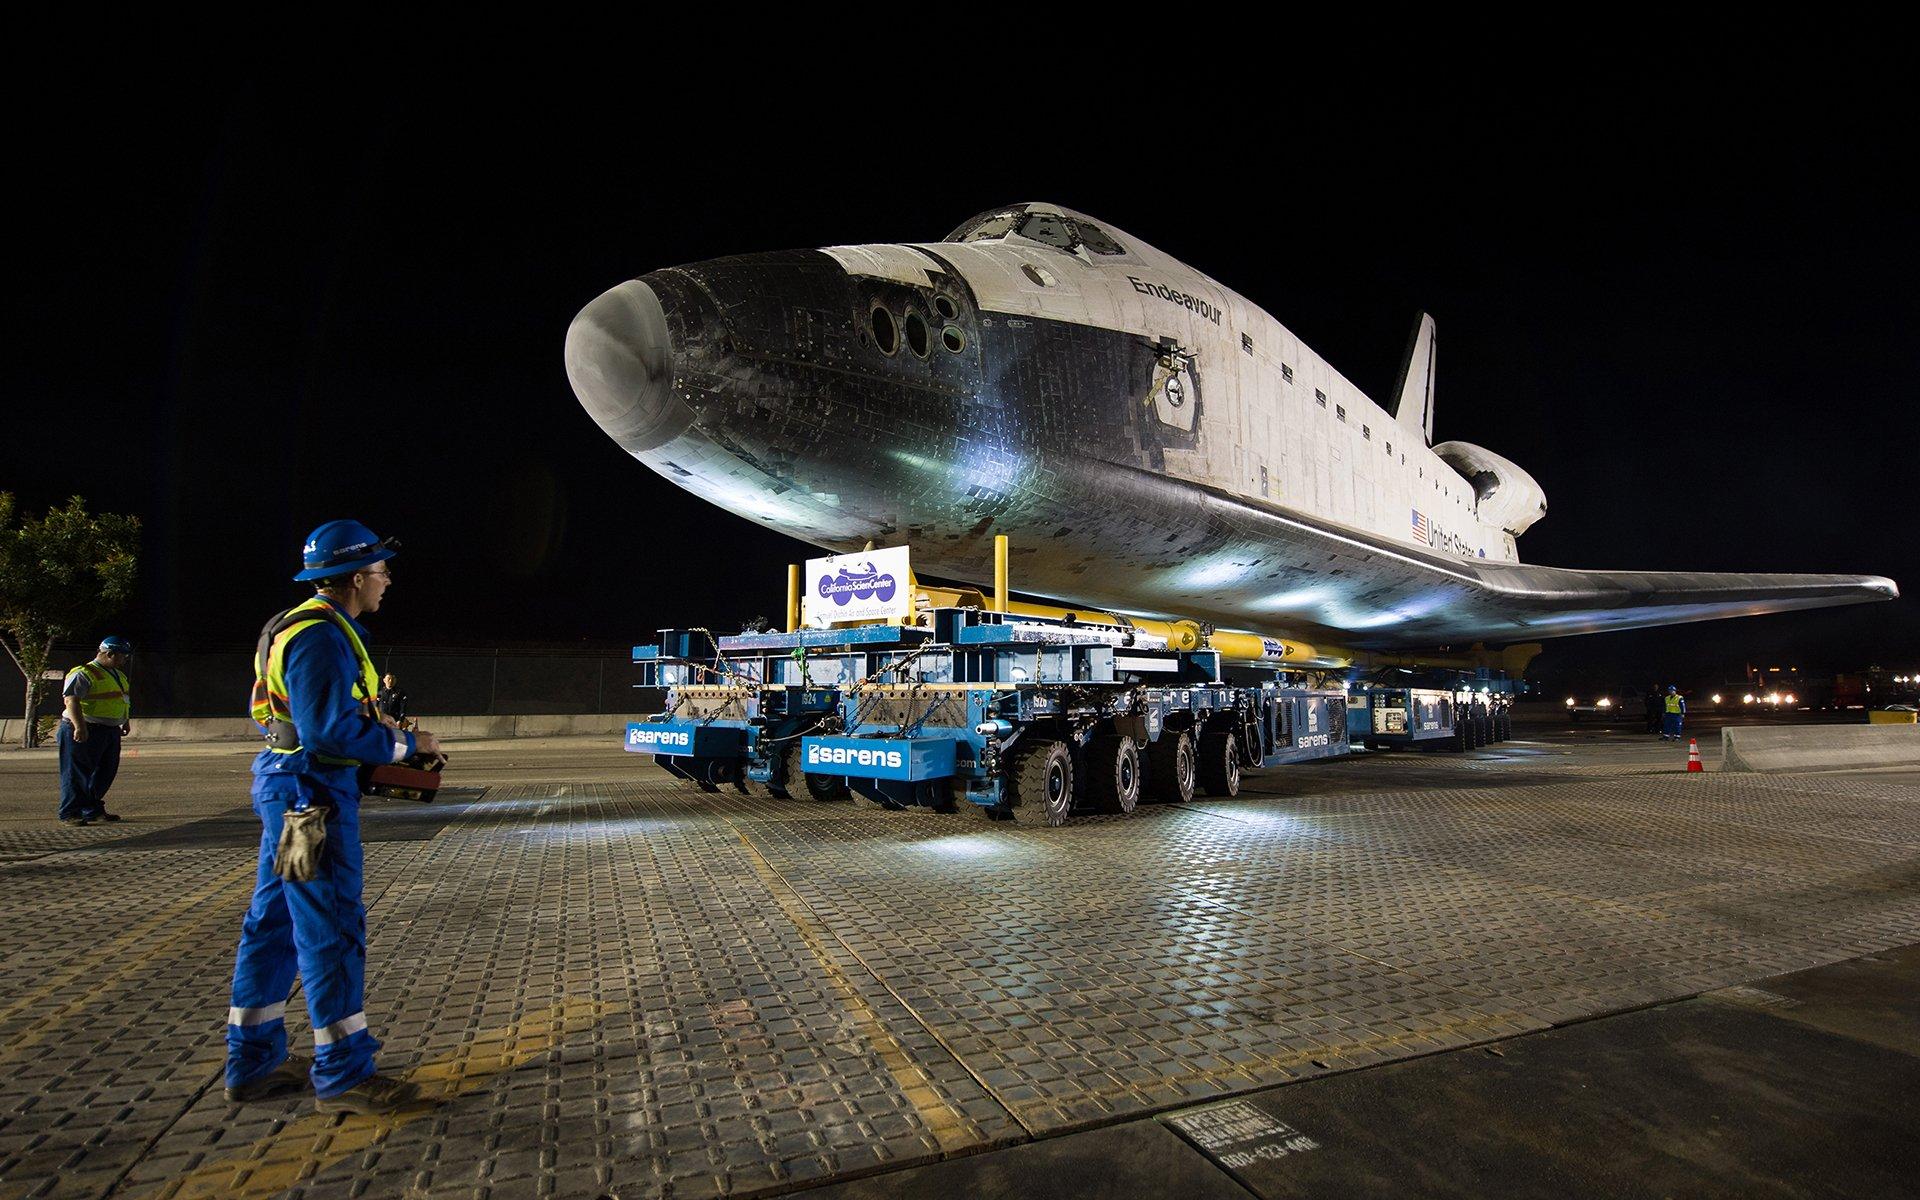 Vehicles - Space Shuttle Endeavour  Shuttle Airplane NASA Space Shuttle Wallpaper